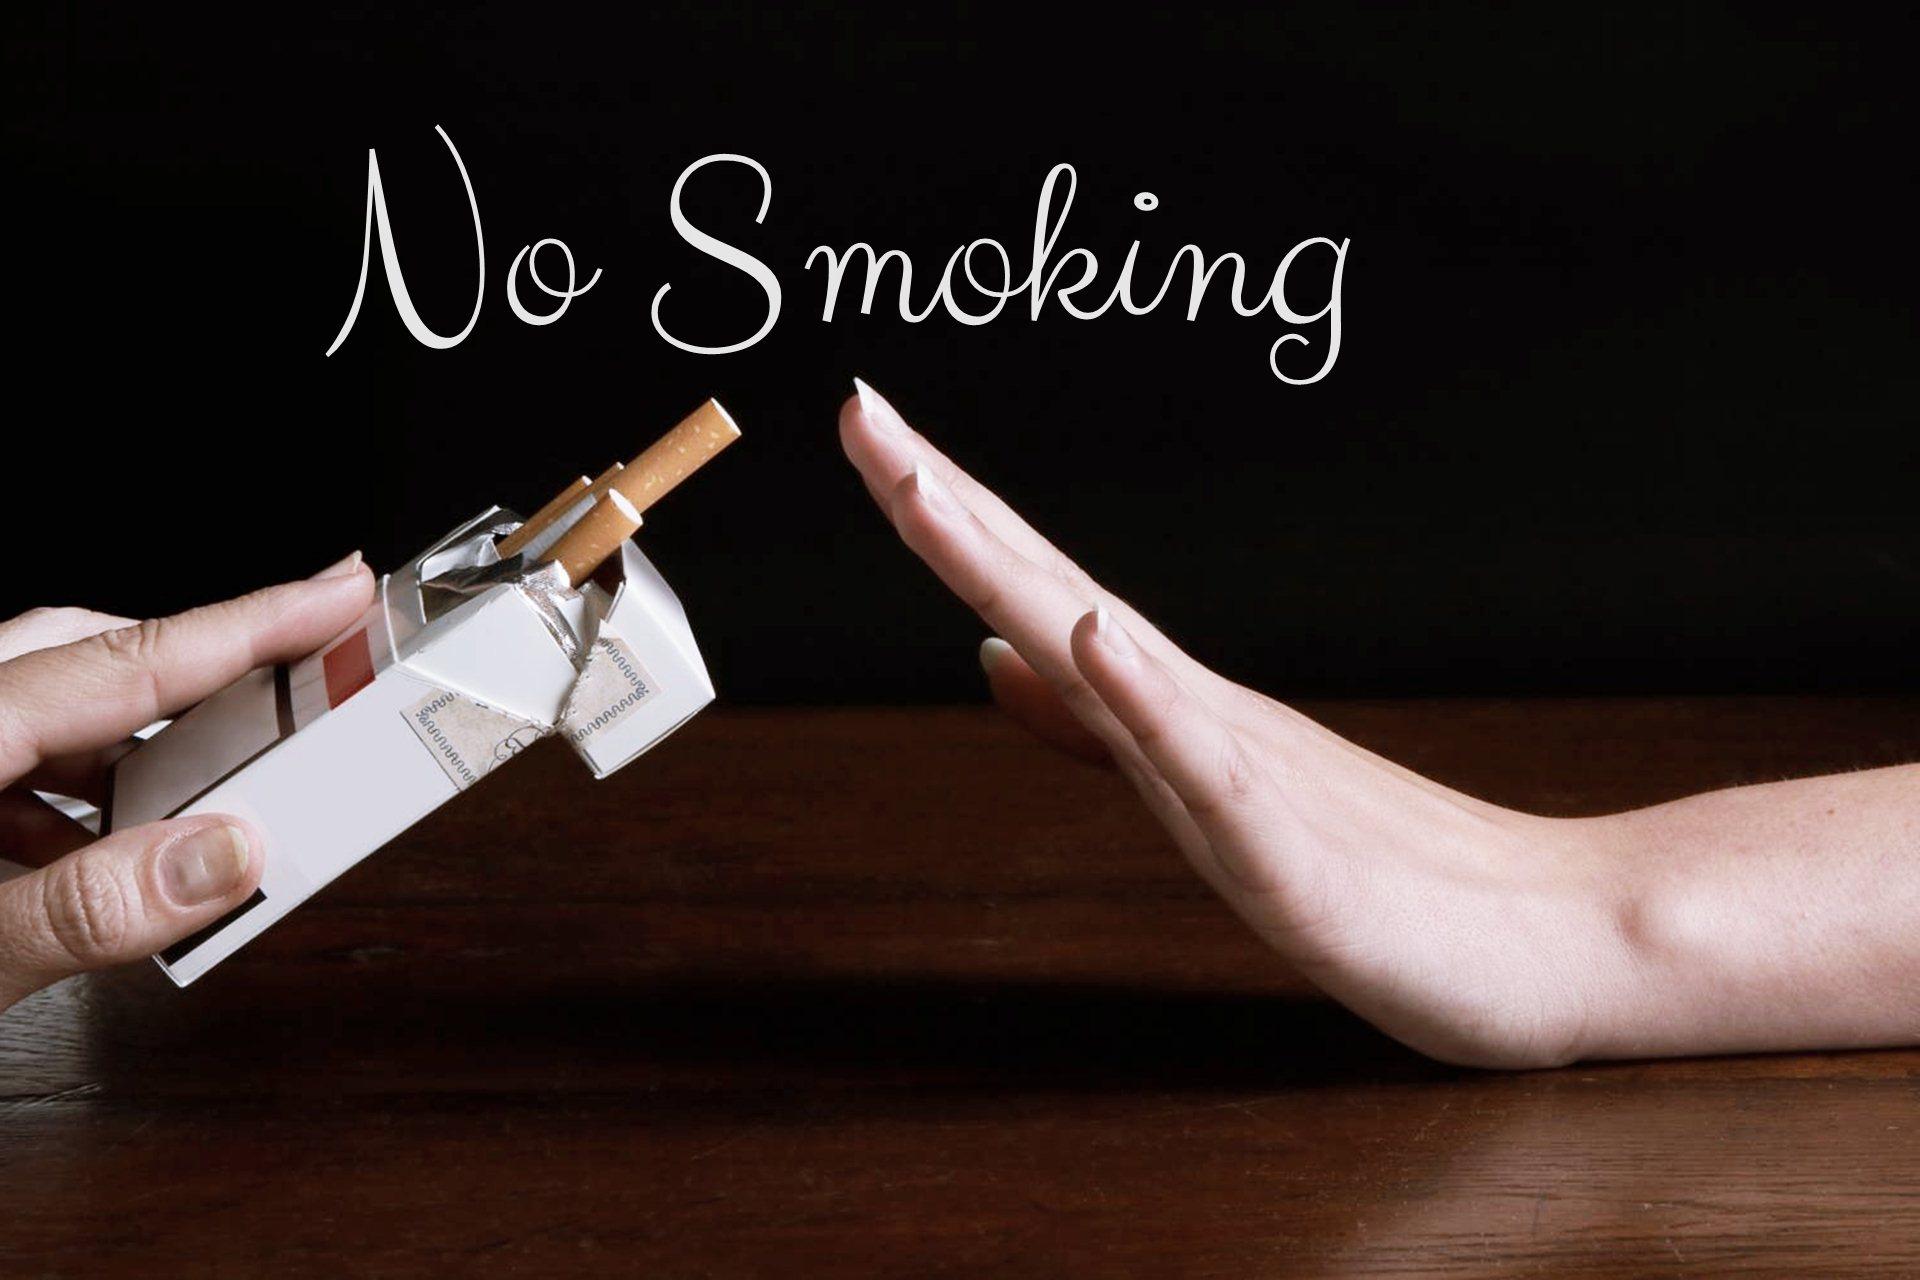 quit smoking wallpaper. stop smoking help, ways to stop smoking